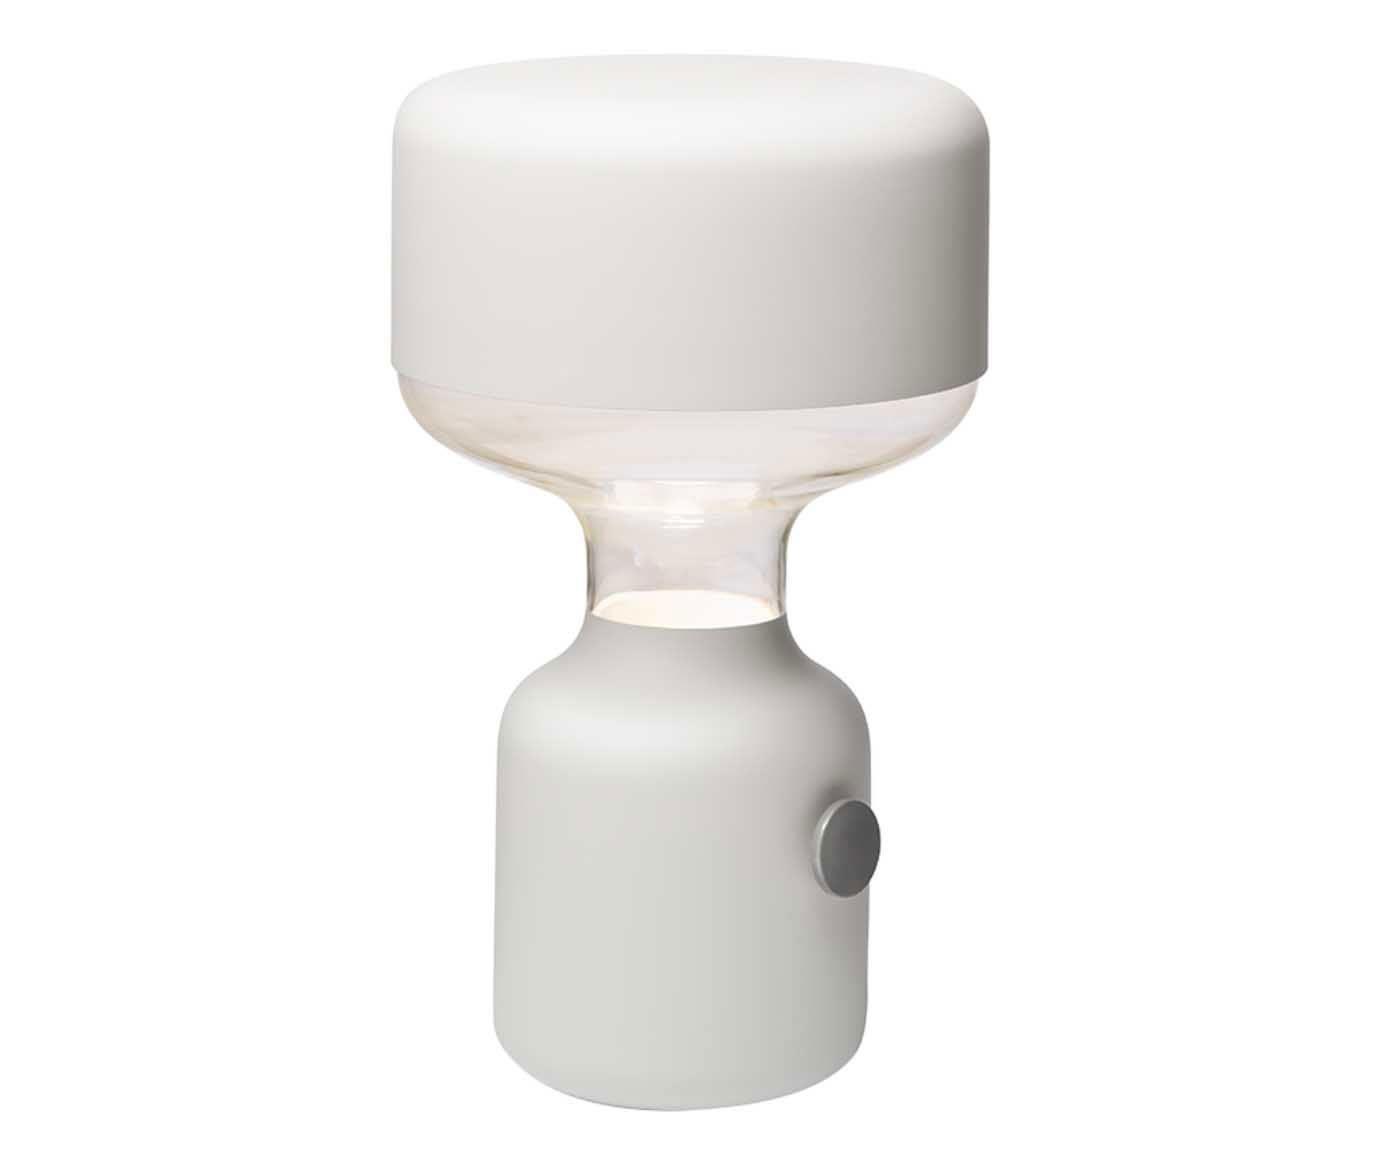 Abajur jinn - la lampe   Westwing.com.br